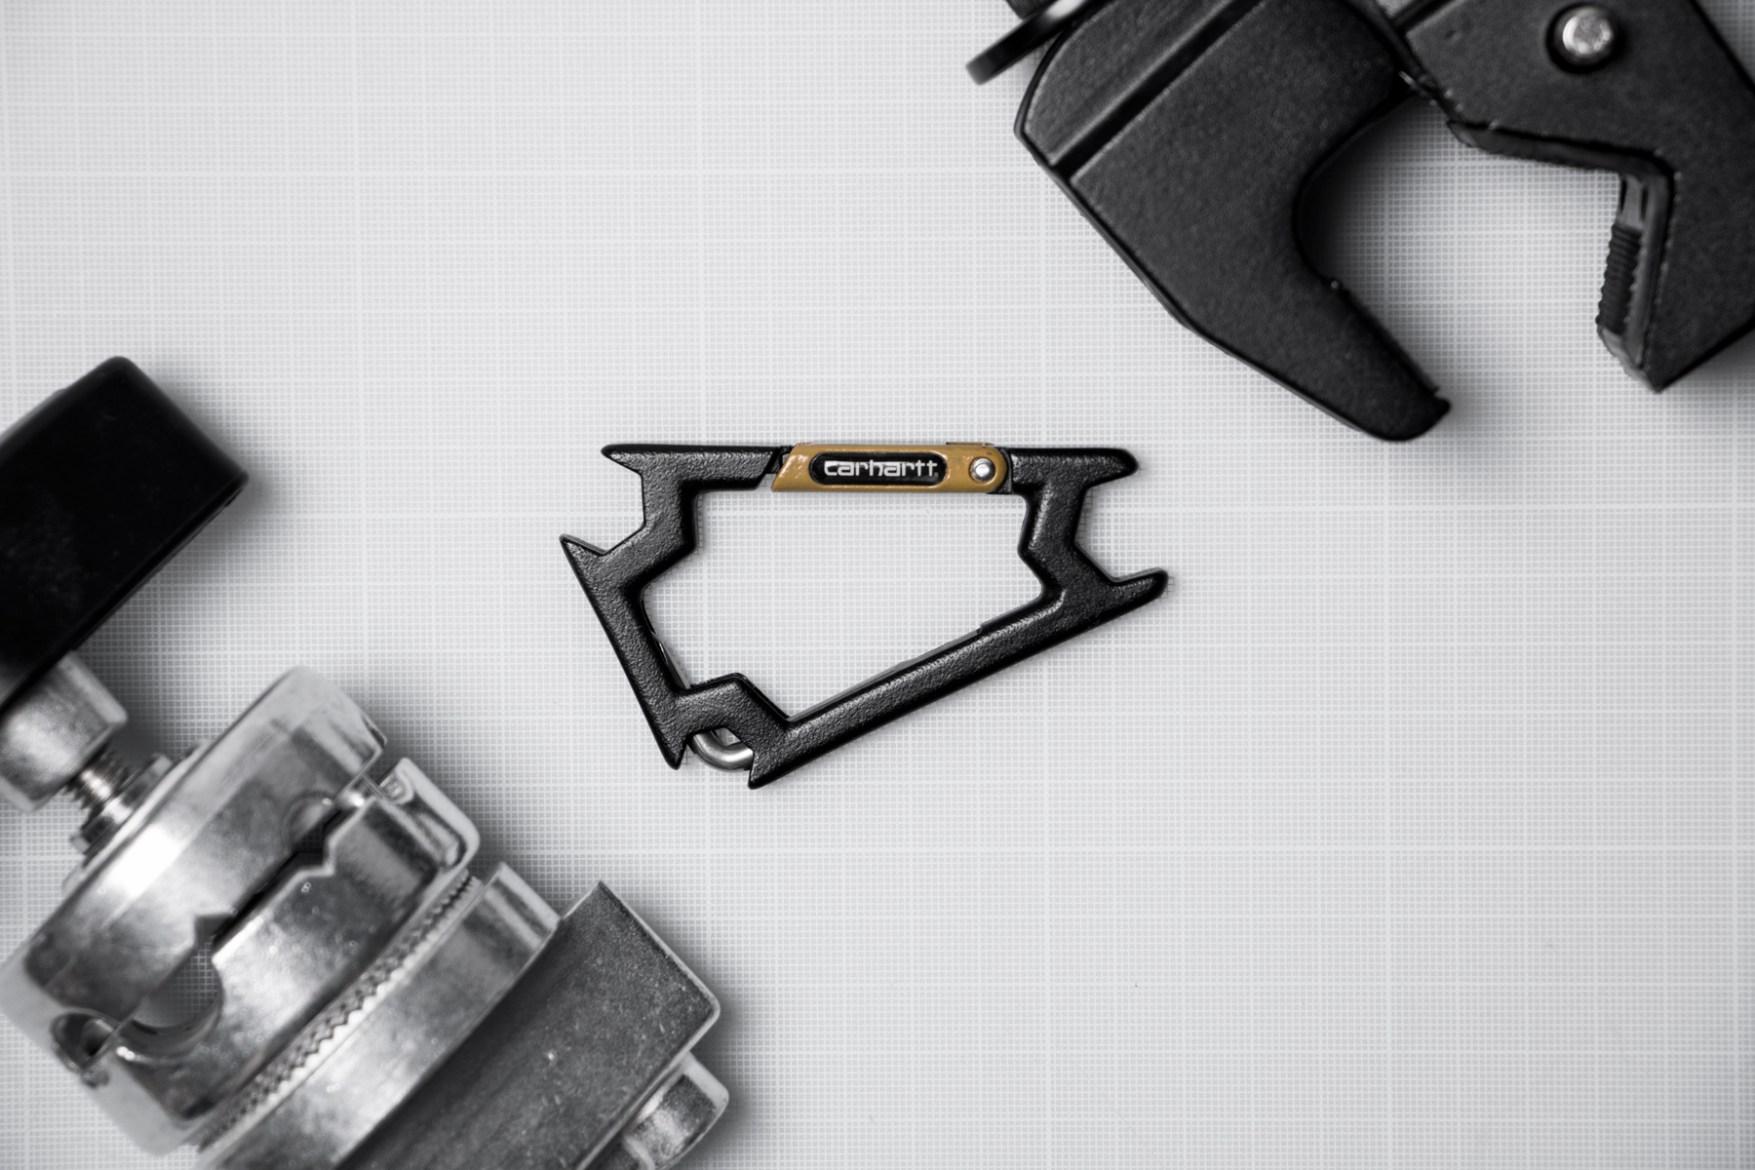 Carhartt WIP x Sk8ology Skateboard Tool Carabiner